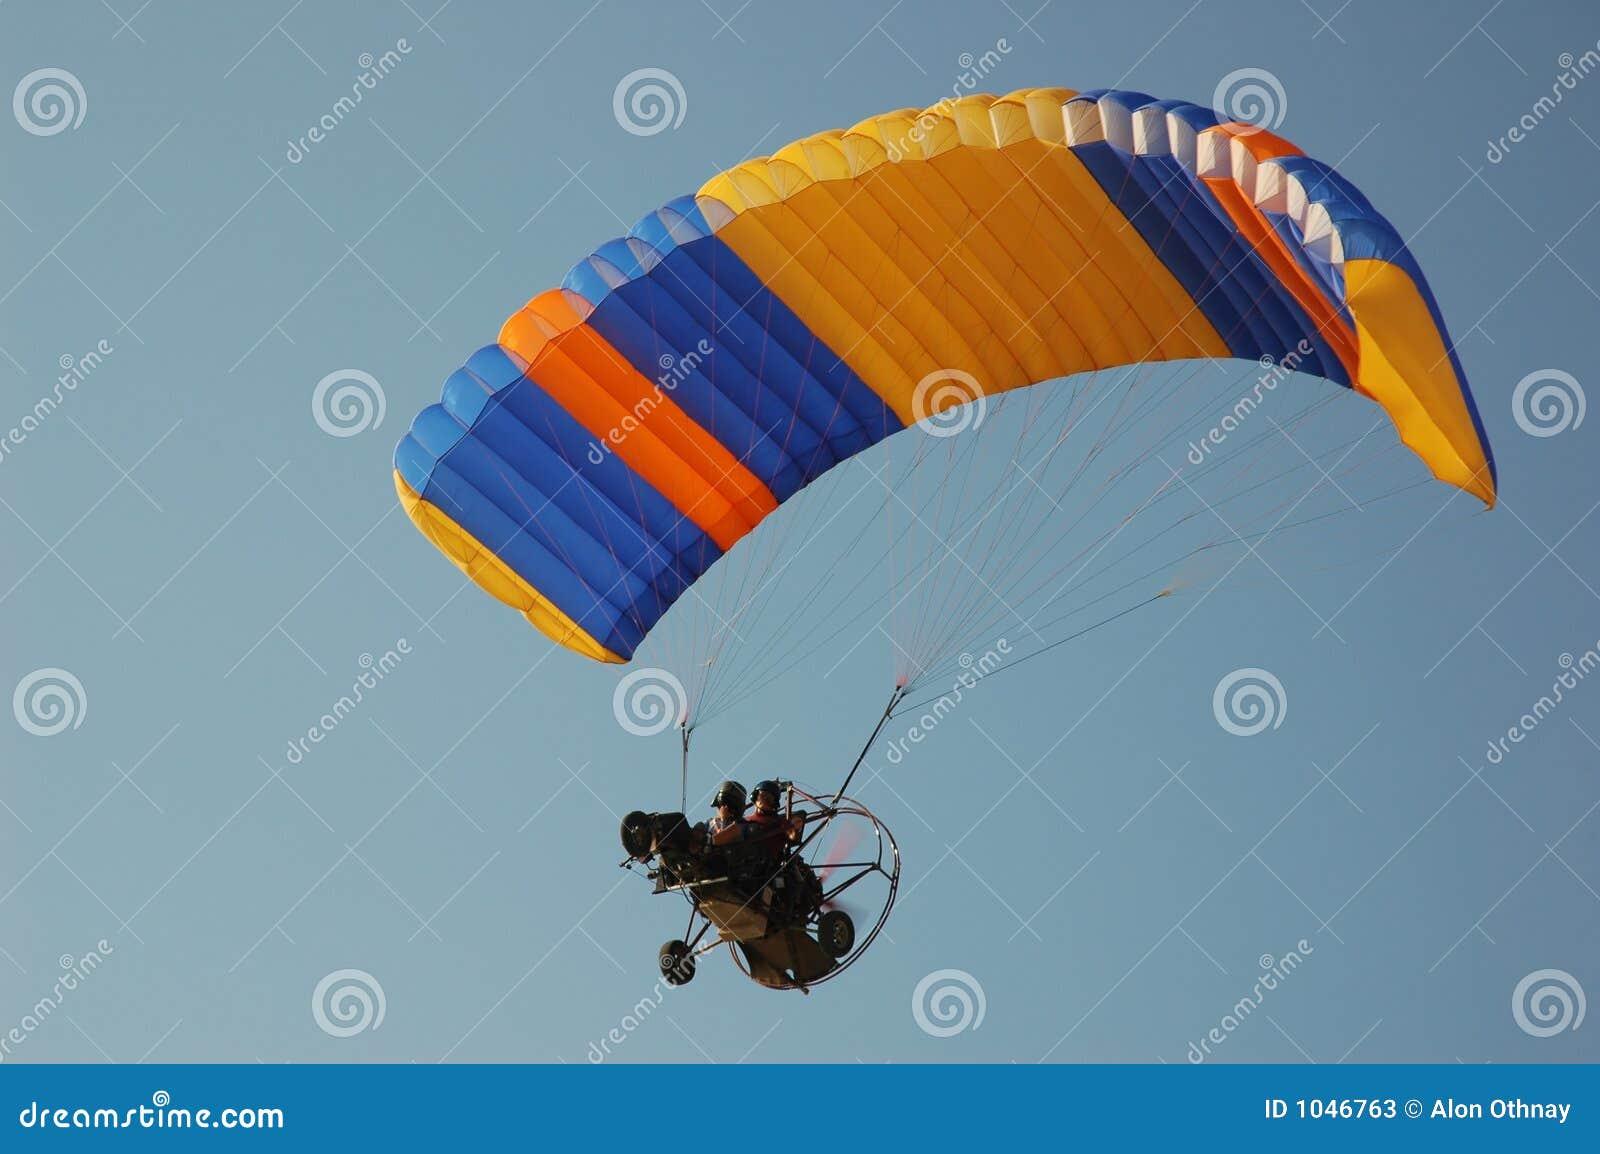 Motor parachute stock photos image 1046763 for Max motor dreams cost